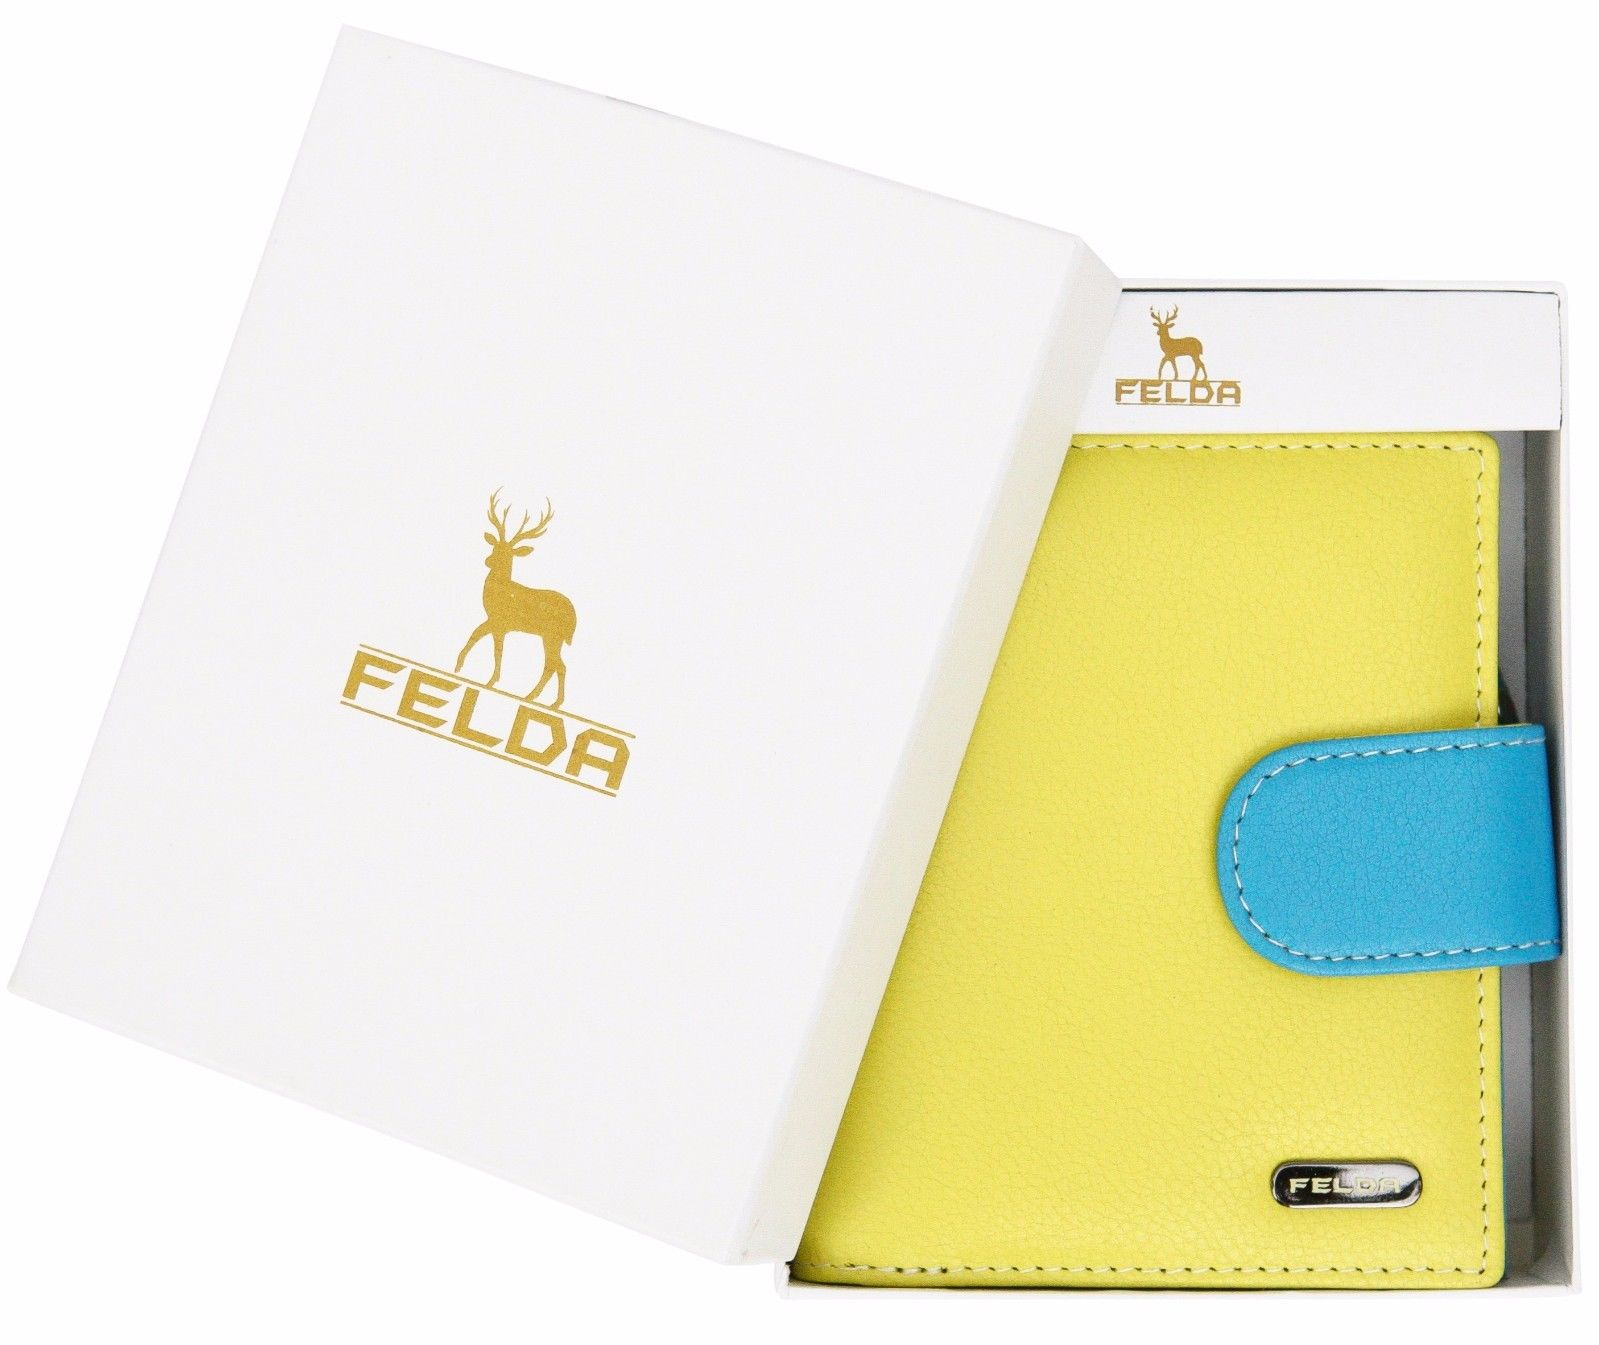 Felda-RFID-onorevoli-MEDAGLIA-amp-Card-Purse-Wallet-Genuine-Leather-Multi-SOFT-BOX-REGALO miniatura 31